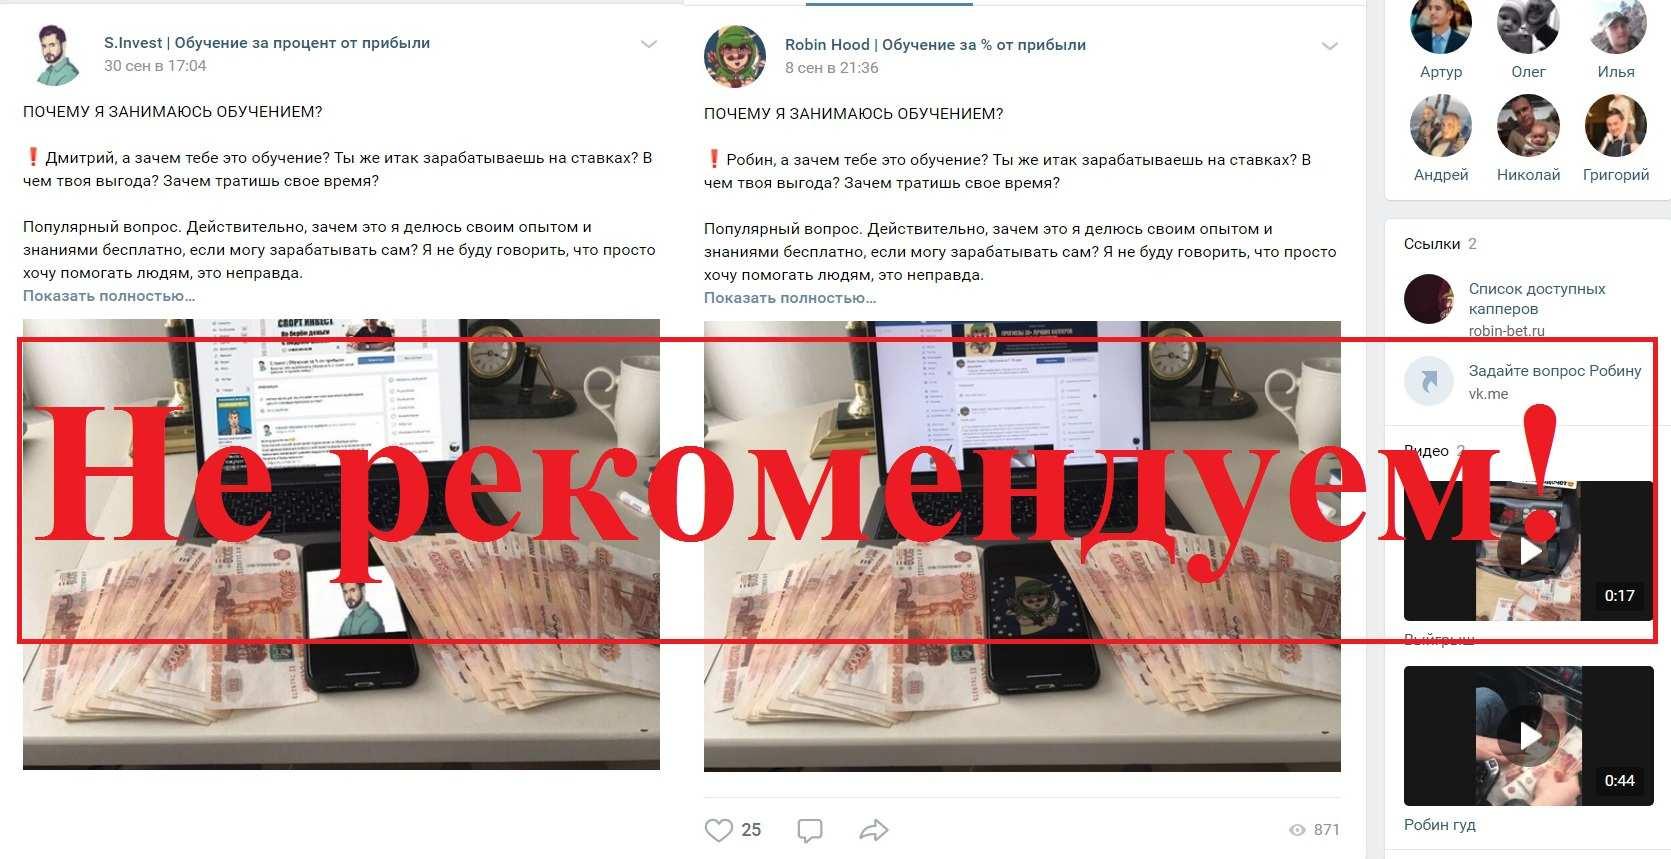 S.Invest – обучение за процент от прибыли Дмитрий Петров